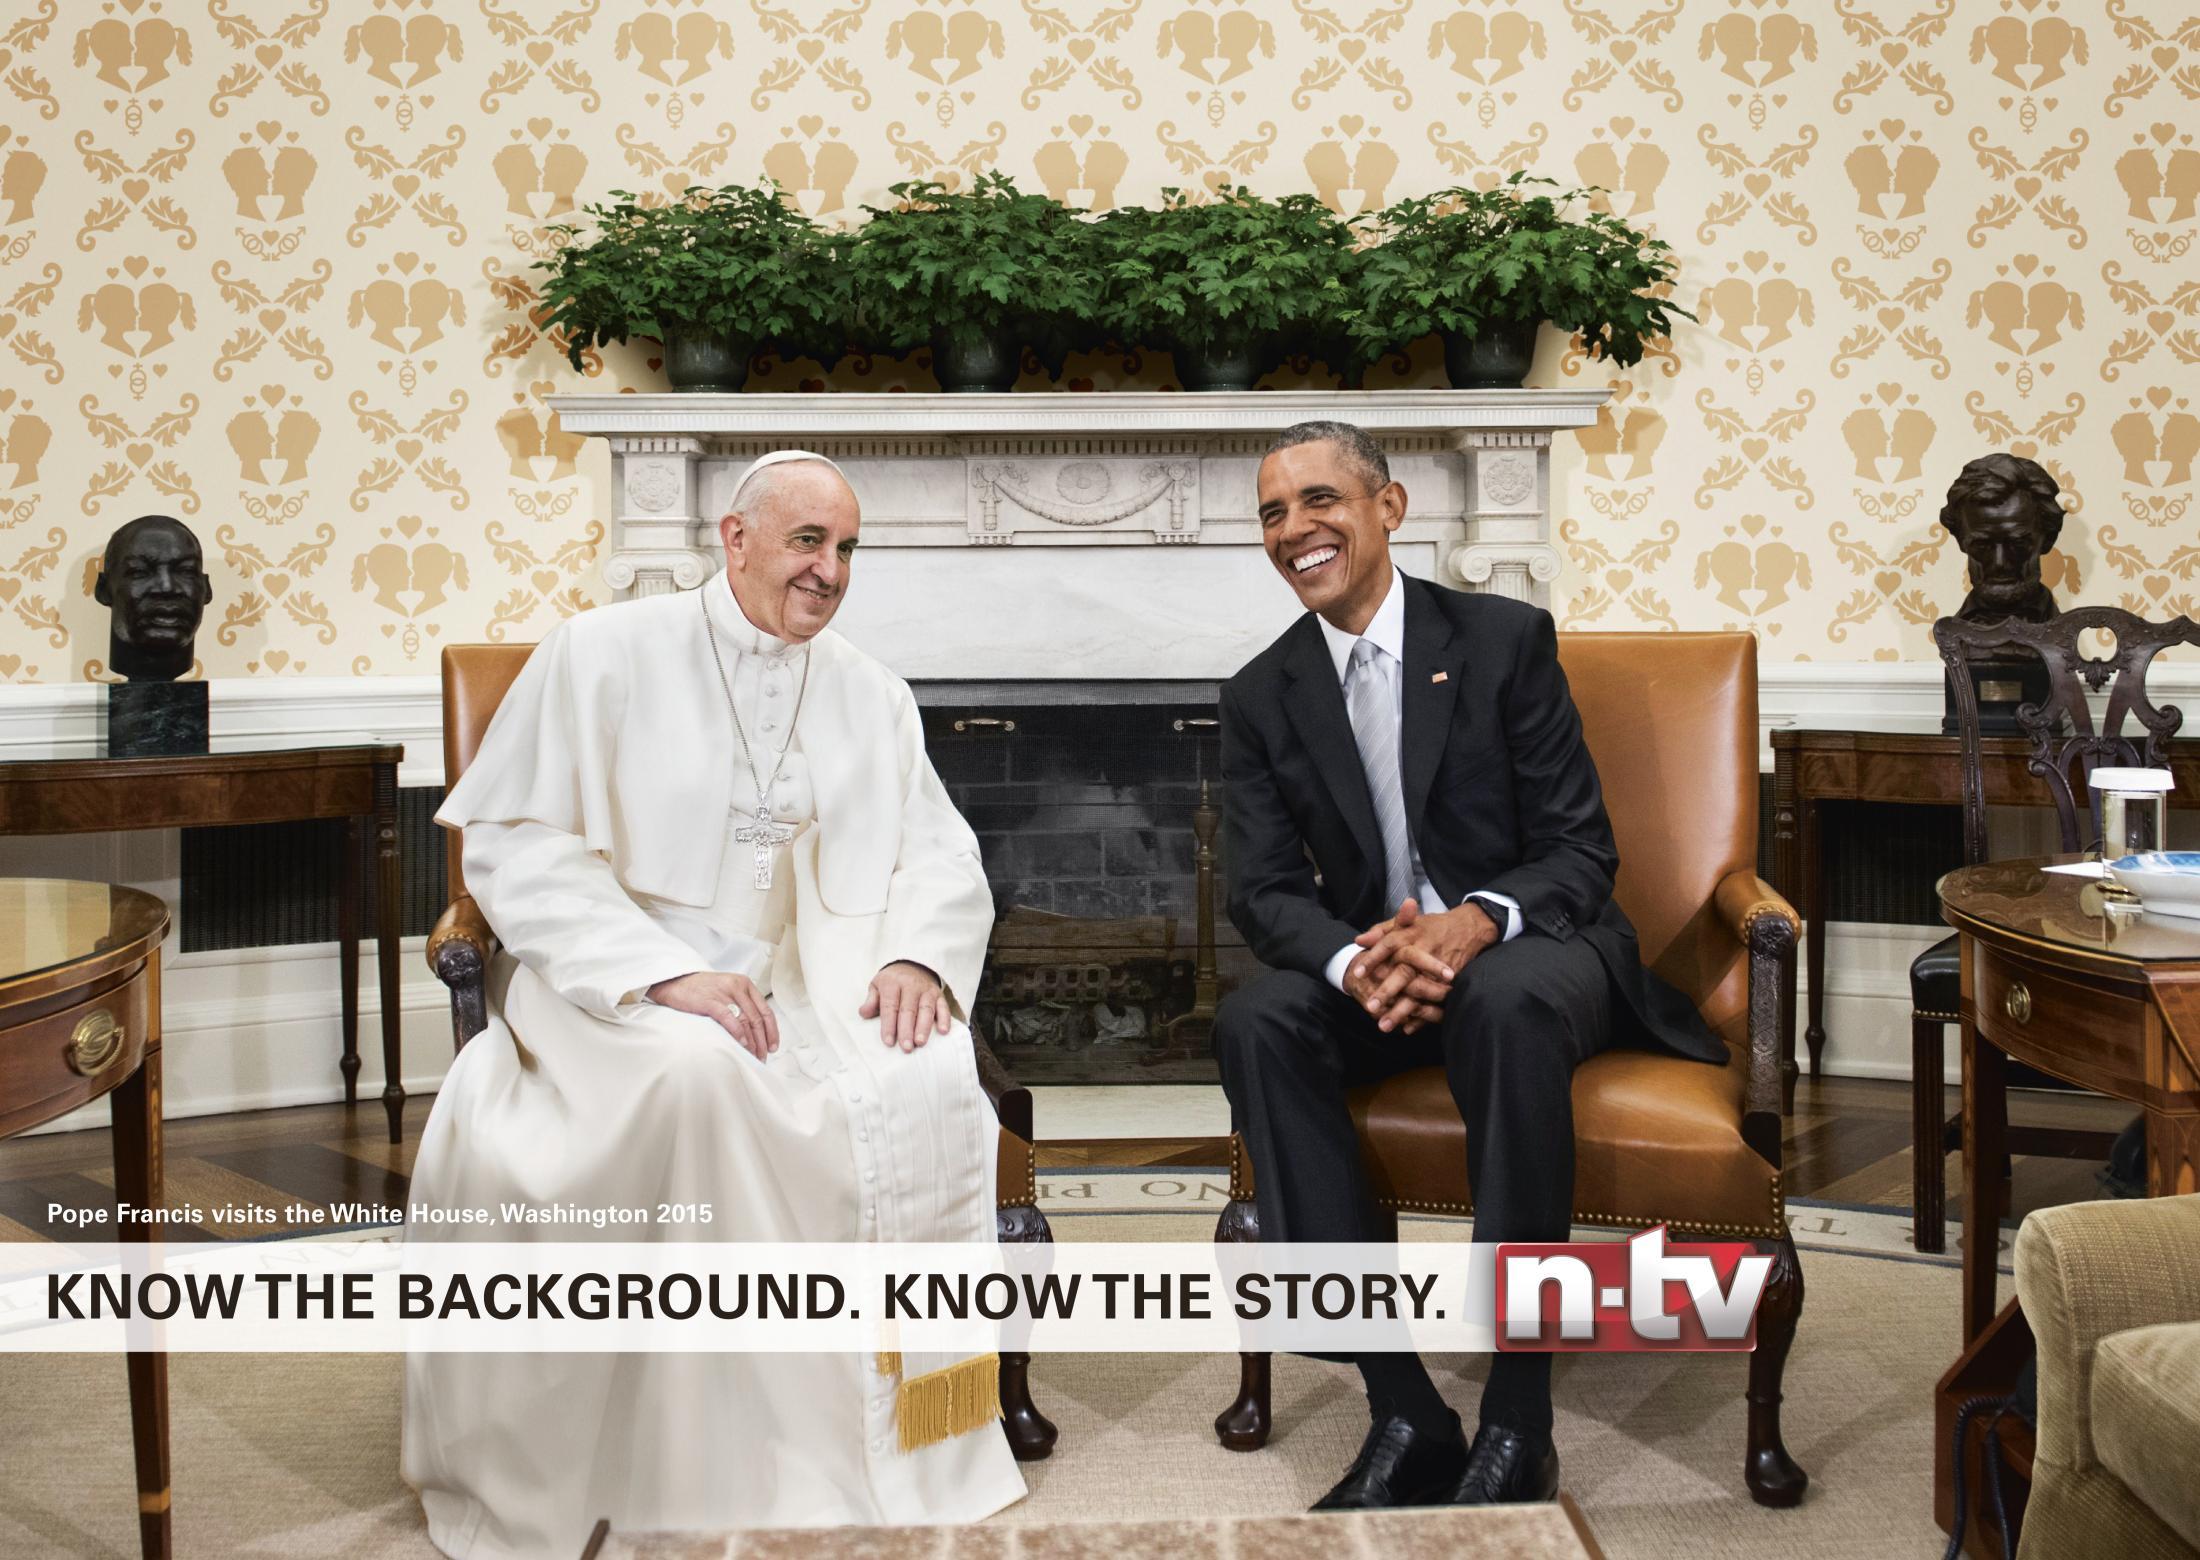 Thumbnail for wallpaper-stories: pope